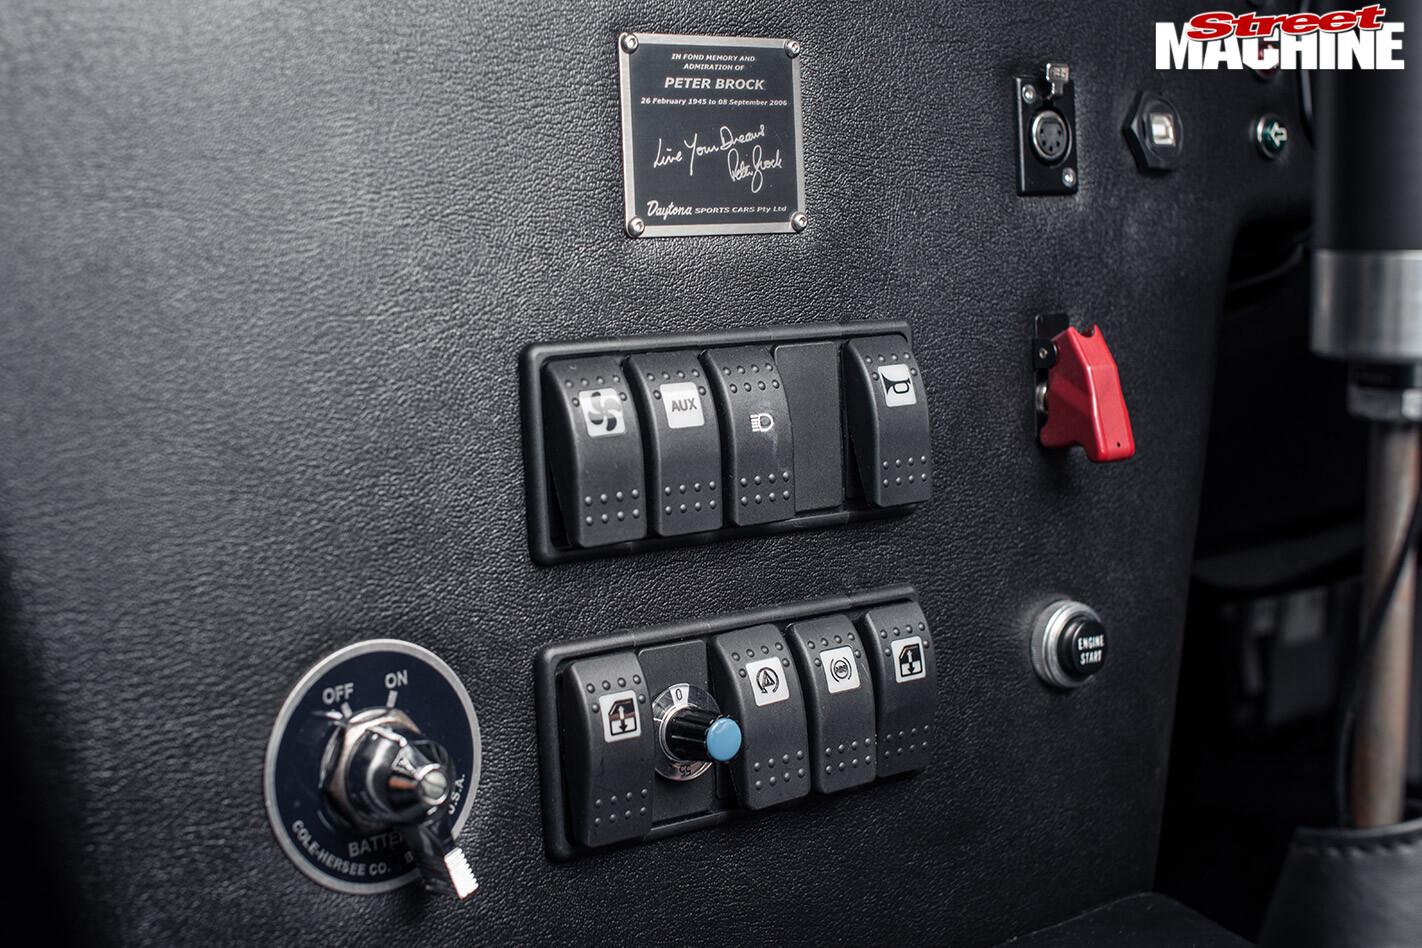 Daytona replica switches